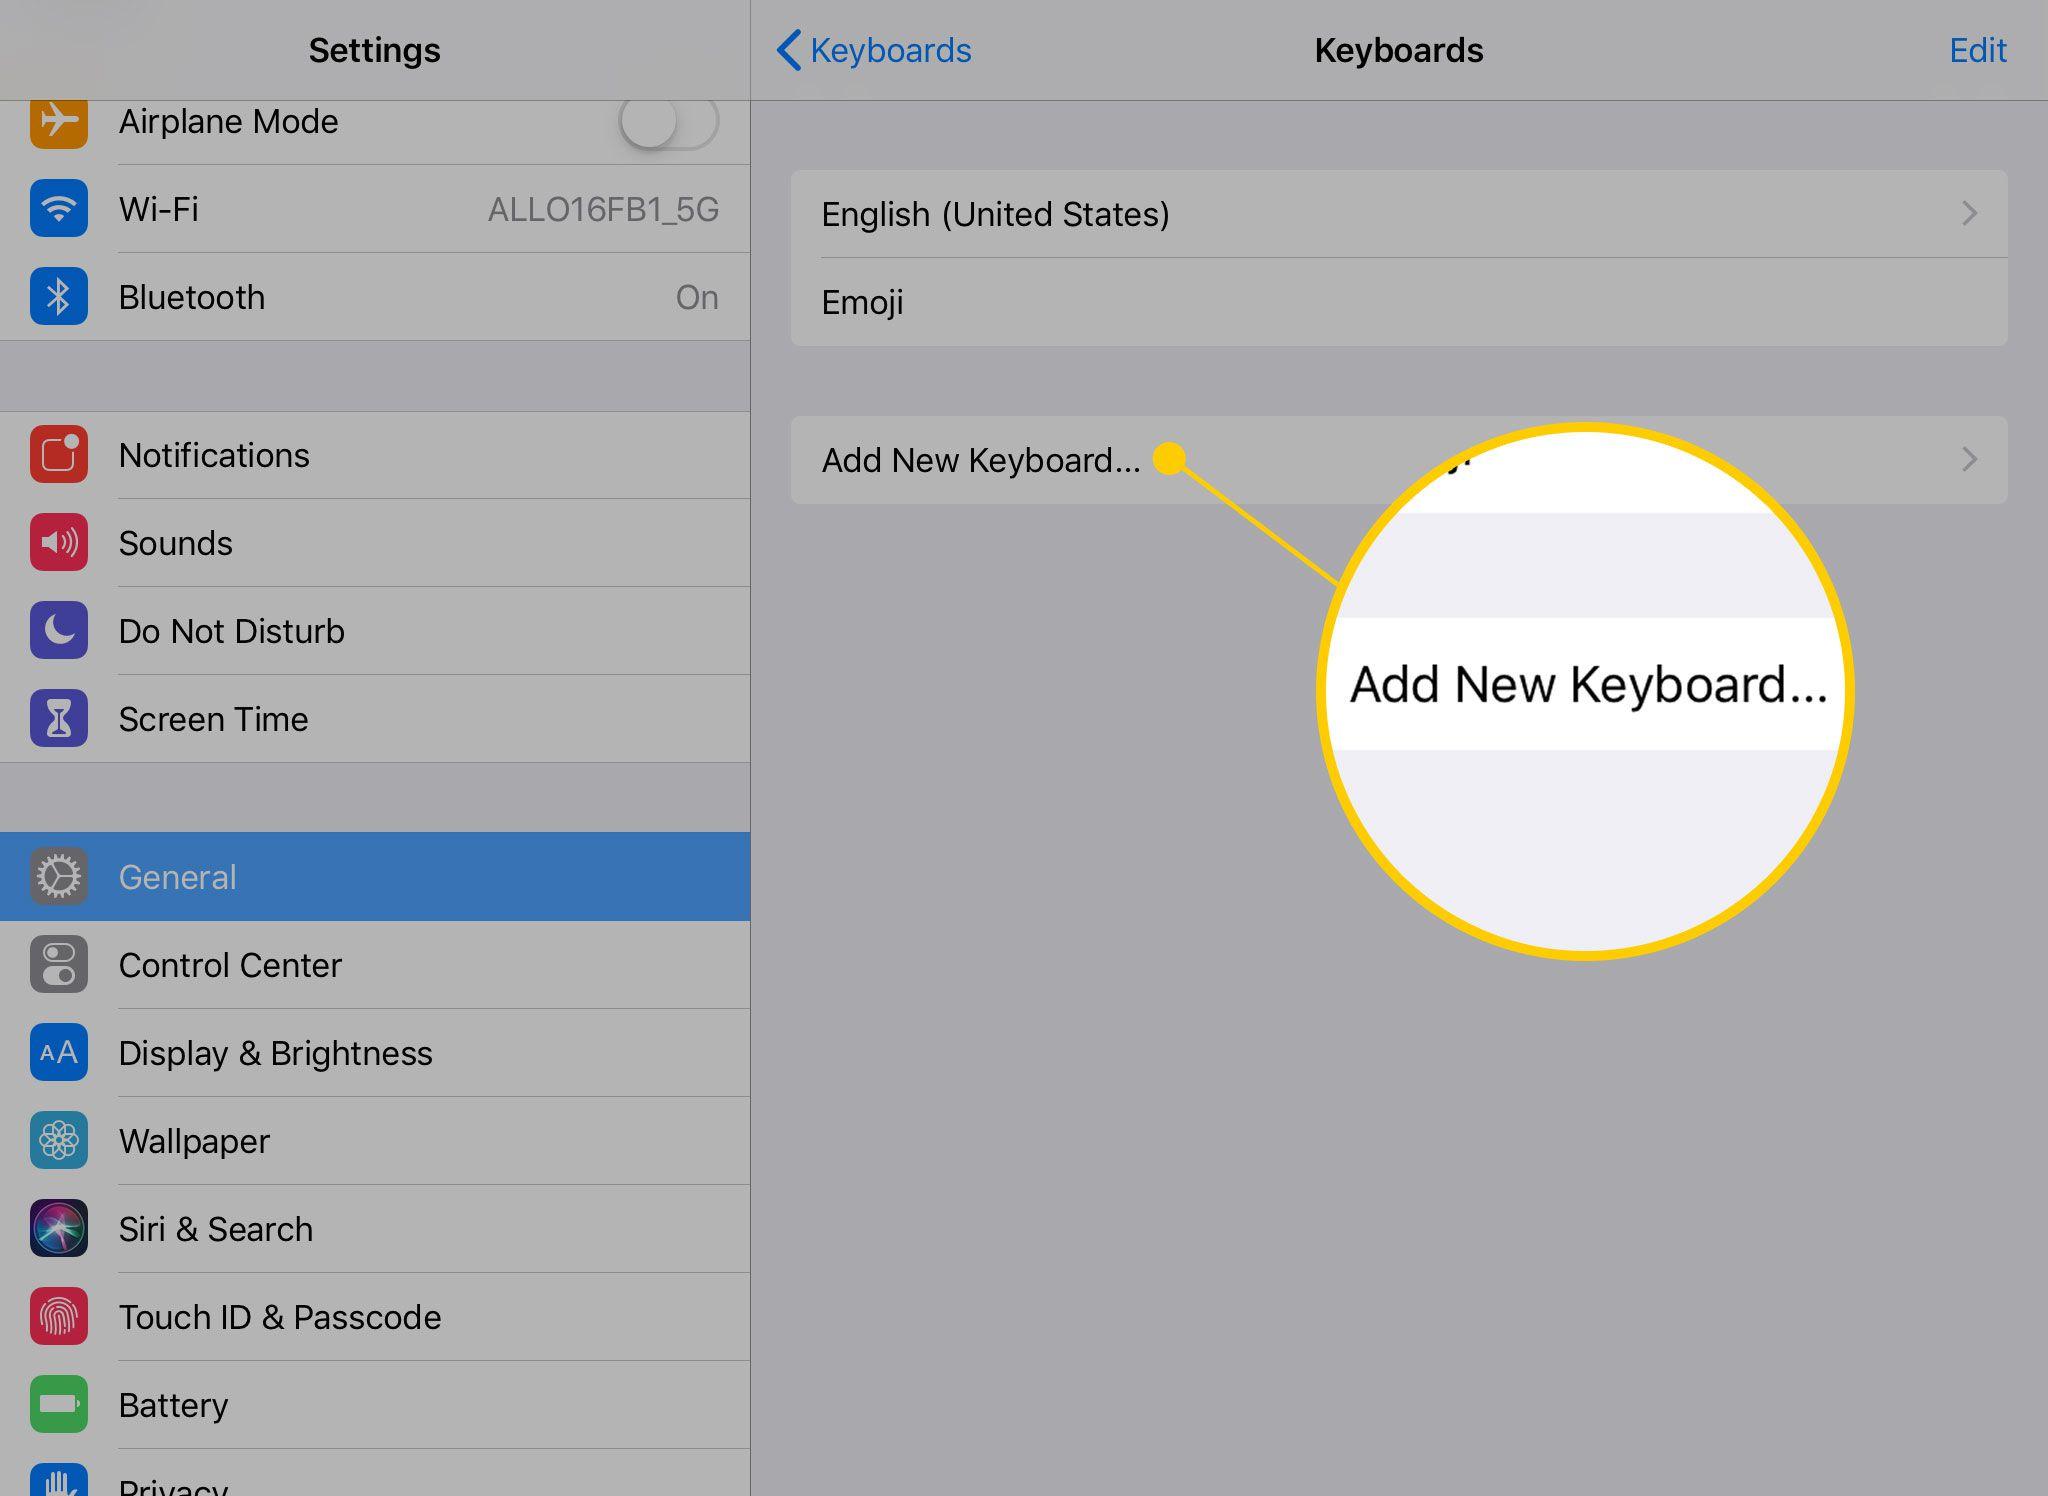 Add New Keyboard on an iPad